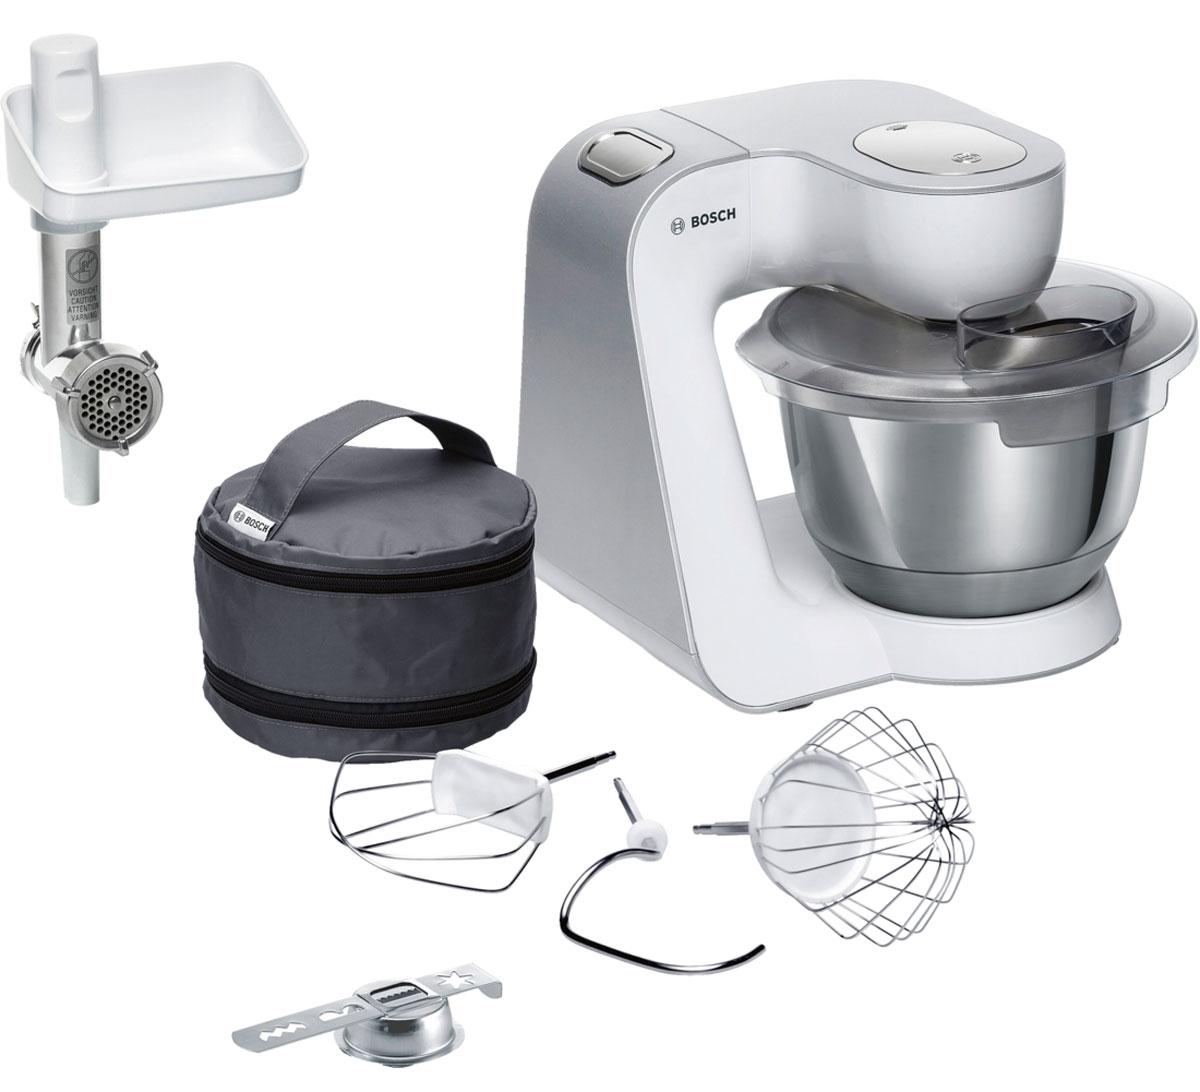 Bosch MUM58225, White кухонный комбайн - Комбайны и мясорубки